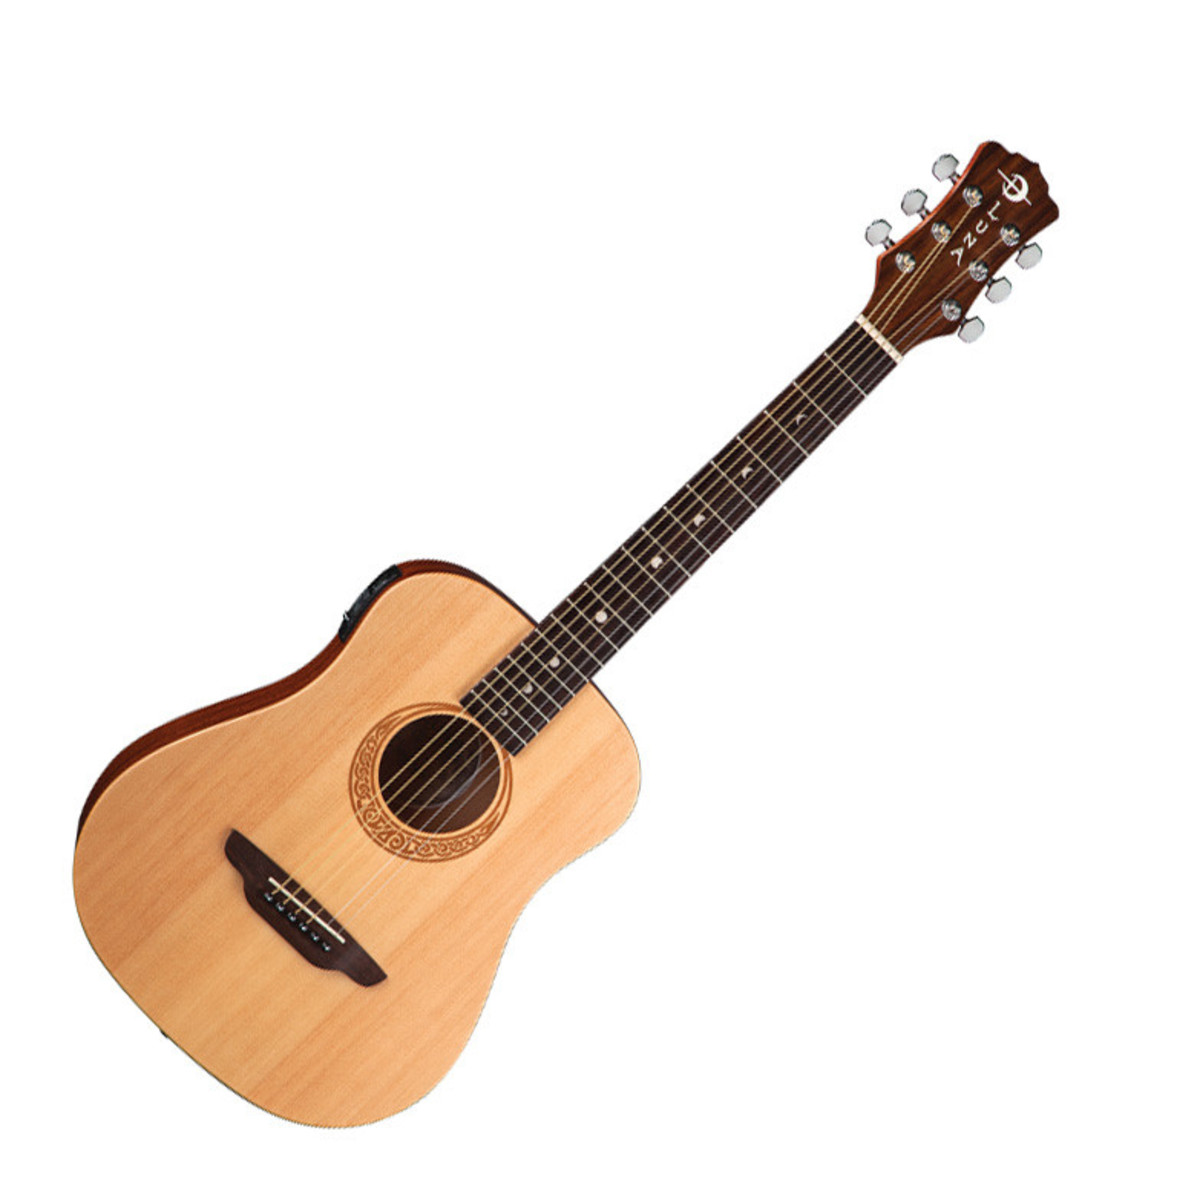 DISC Luna Safari Muse Electro Acoustic Travel Guitar at Gear4music